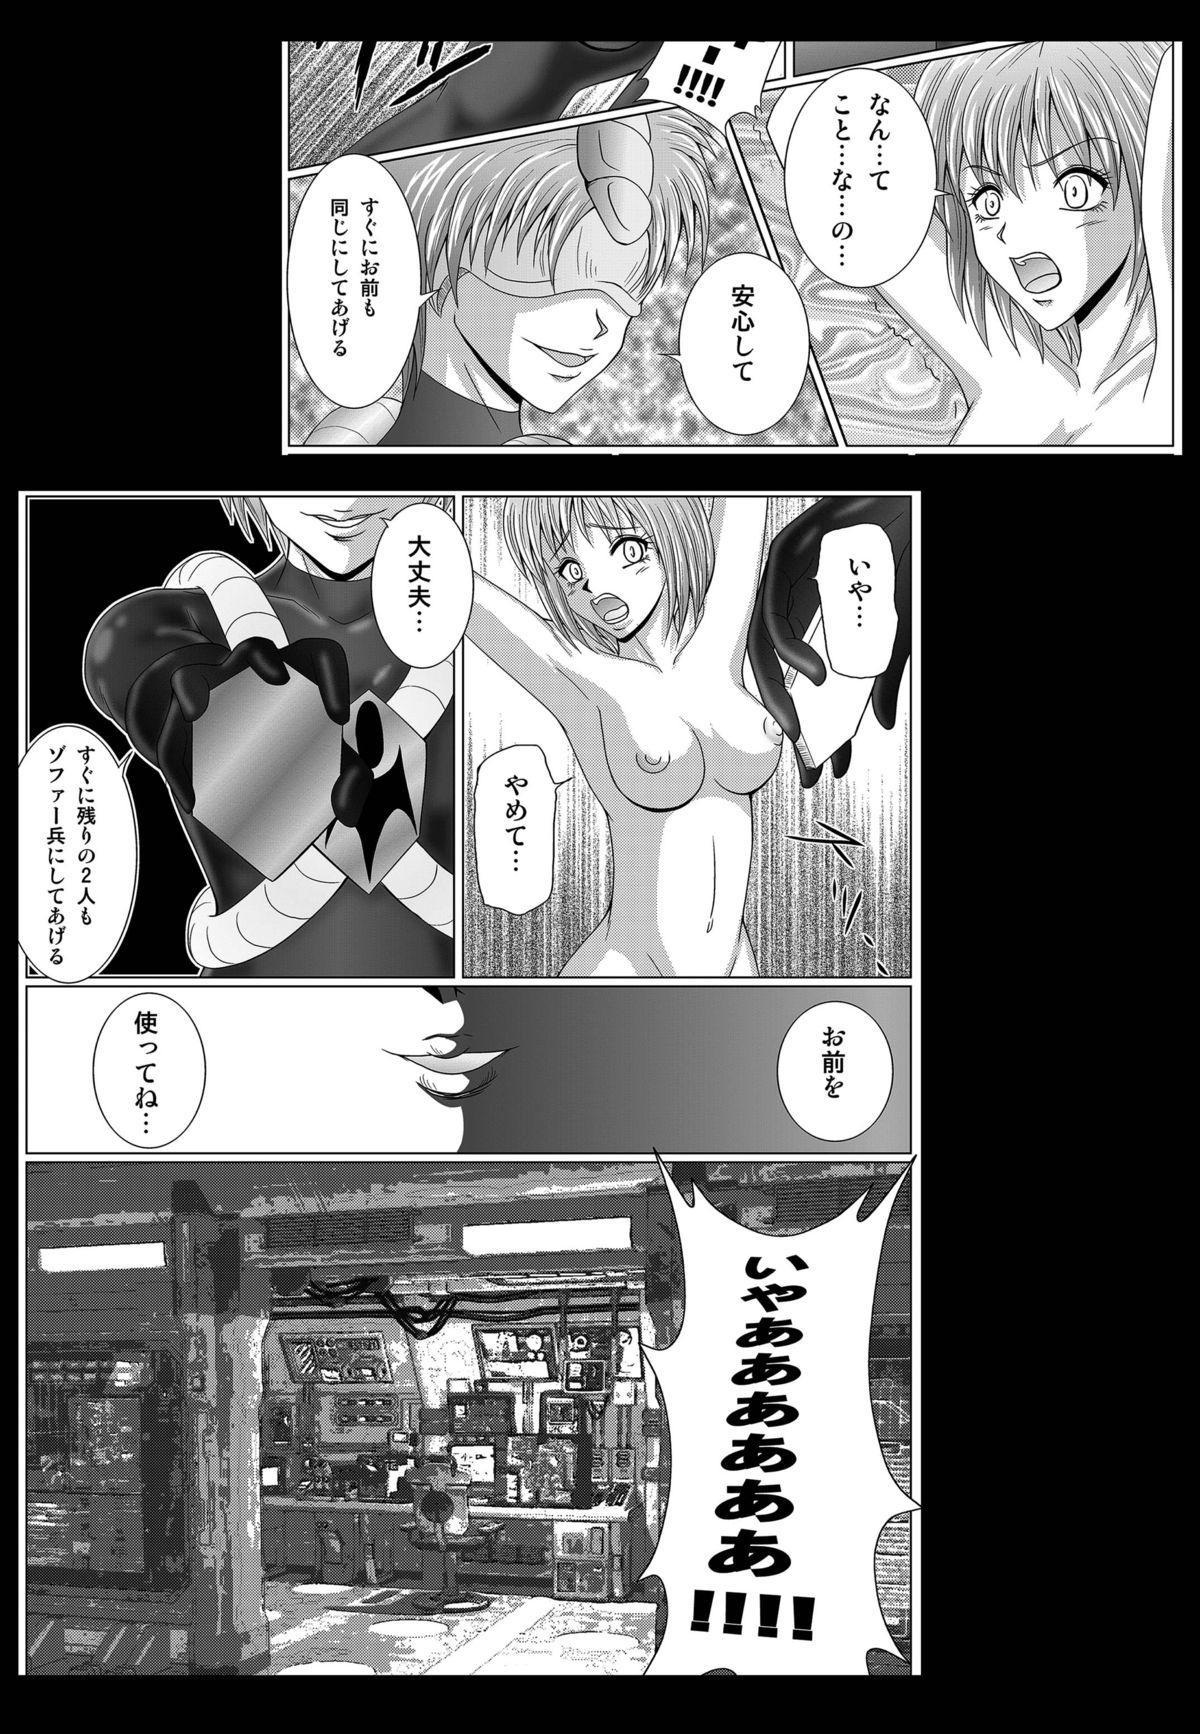 [Macxe's (monmon)] Tokubousentai Dinaranger ~Heroine Kairaku Sennou Keikaku~ Vol.01/02/03 (Renkaban) [Digital] 43